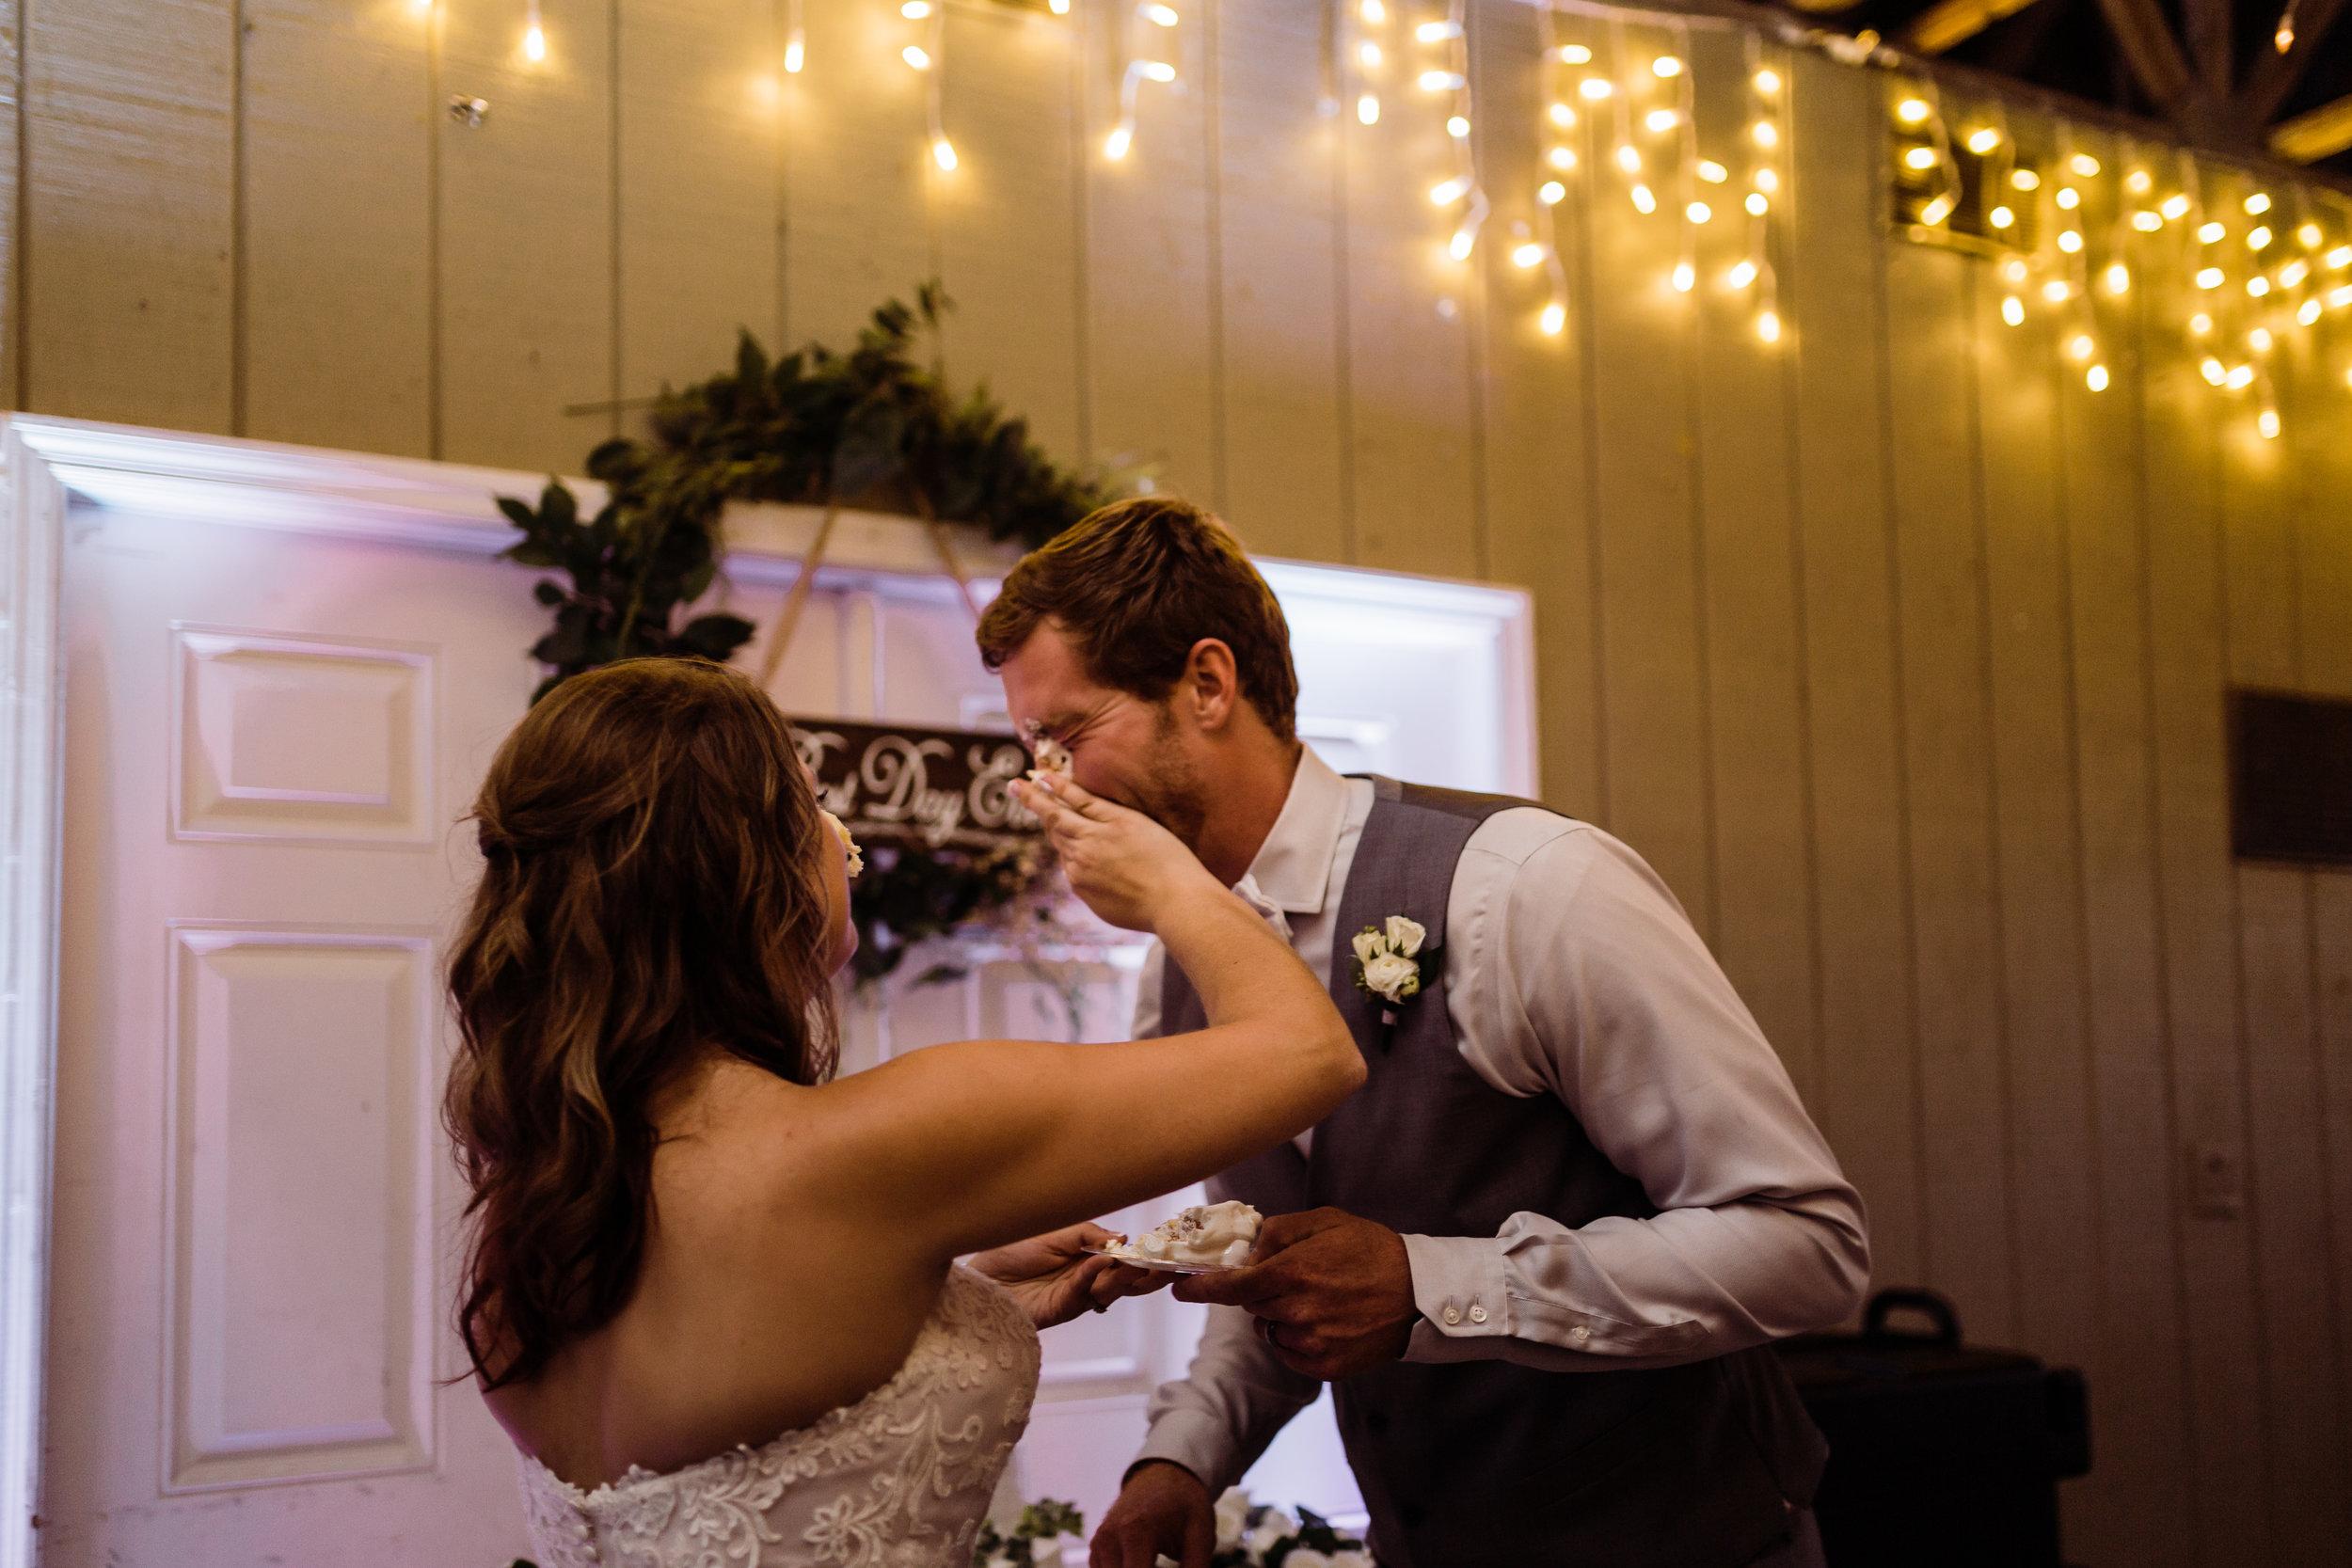 2017.10.14 Samantha and Matthew Crabtree Sarasota Wedding (550 of 708).jpg